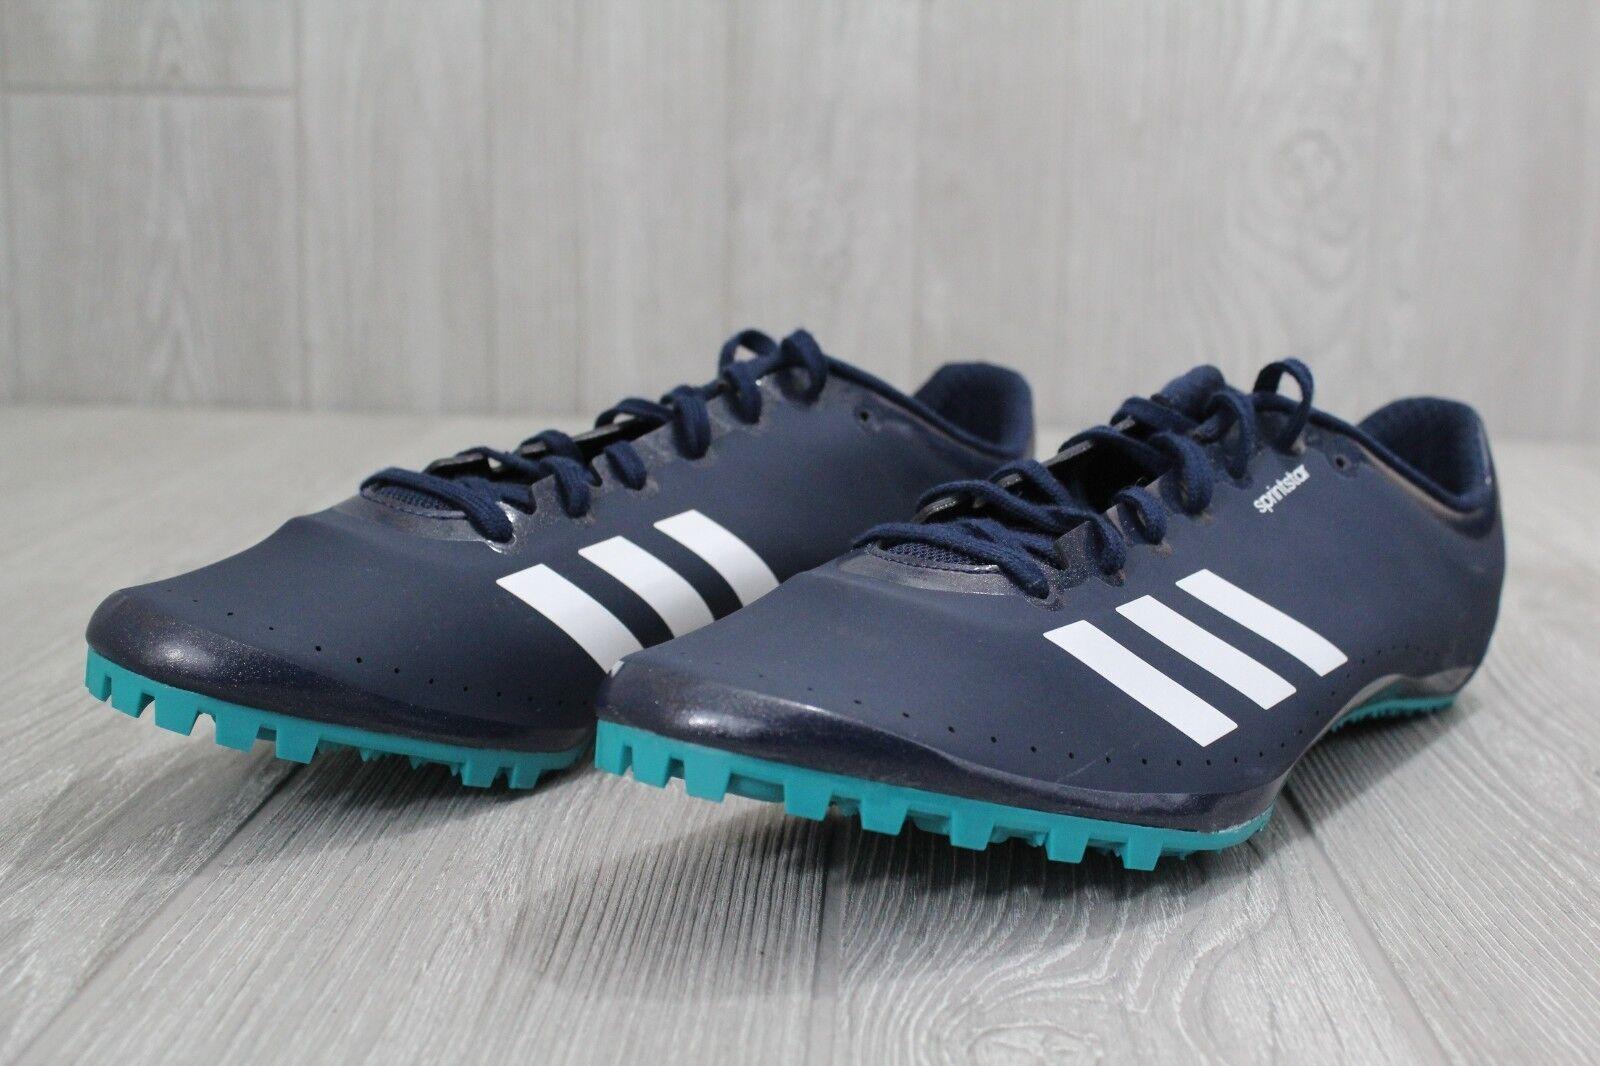 26 nuove adidas Uomo atletica scarpe 11,5 sprintstar blu af5598 navy verde acqua af5598 blu a5ff4e